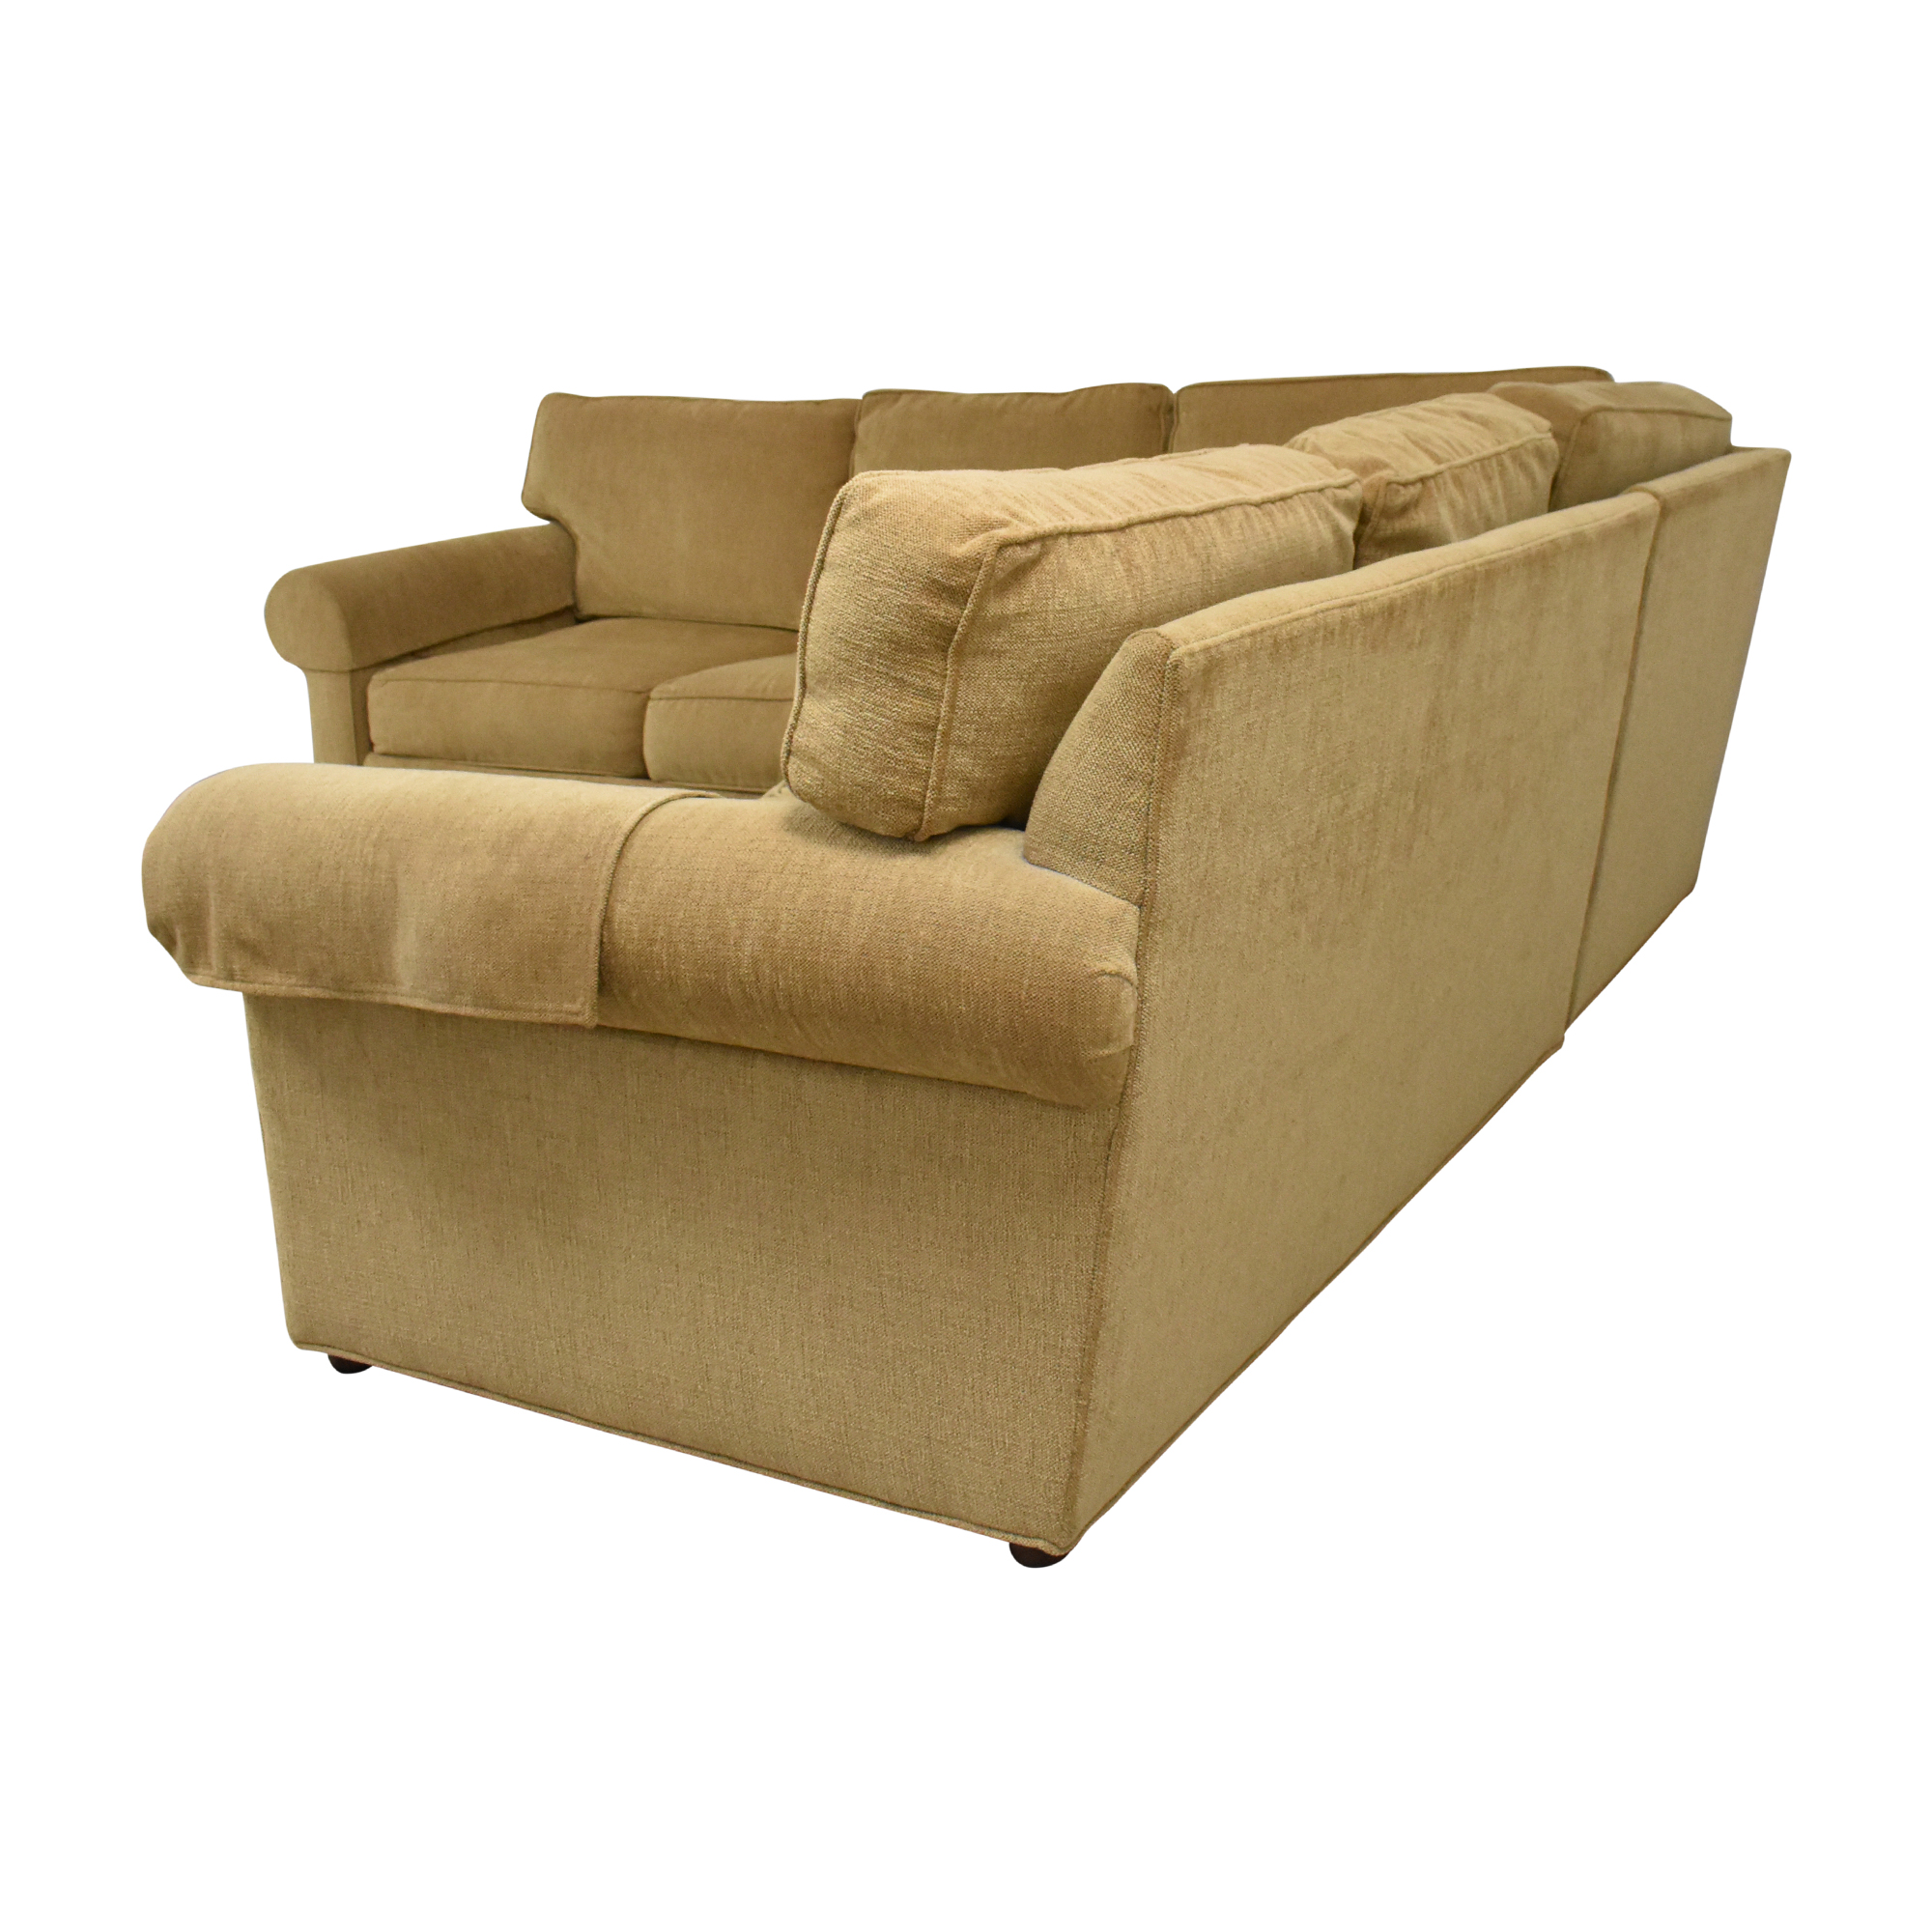 Ethan Allen Ethan Allen Retreat Roll-Arm Three-Piece Sectional Sofa discount